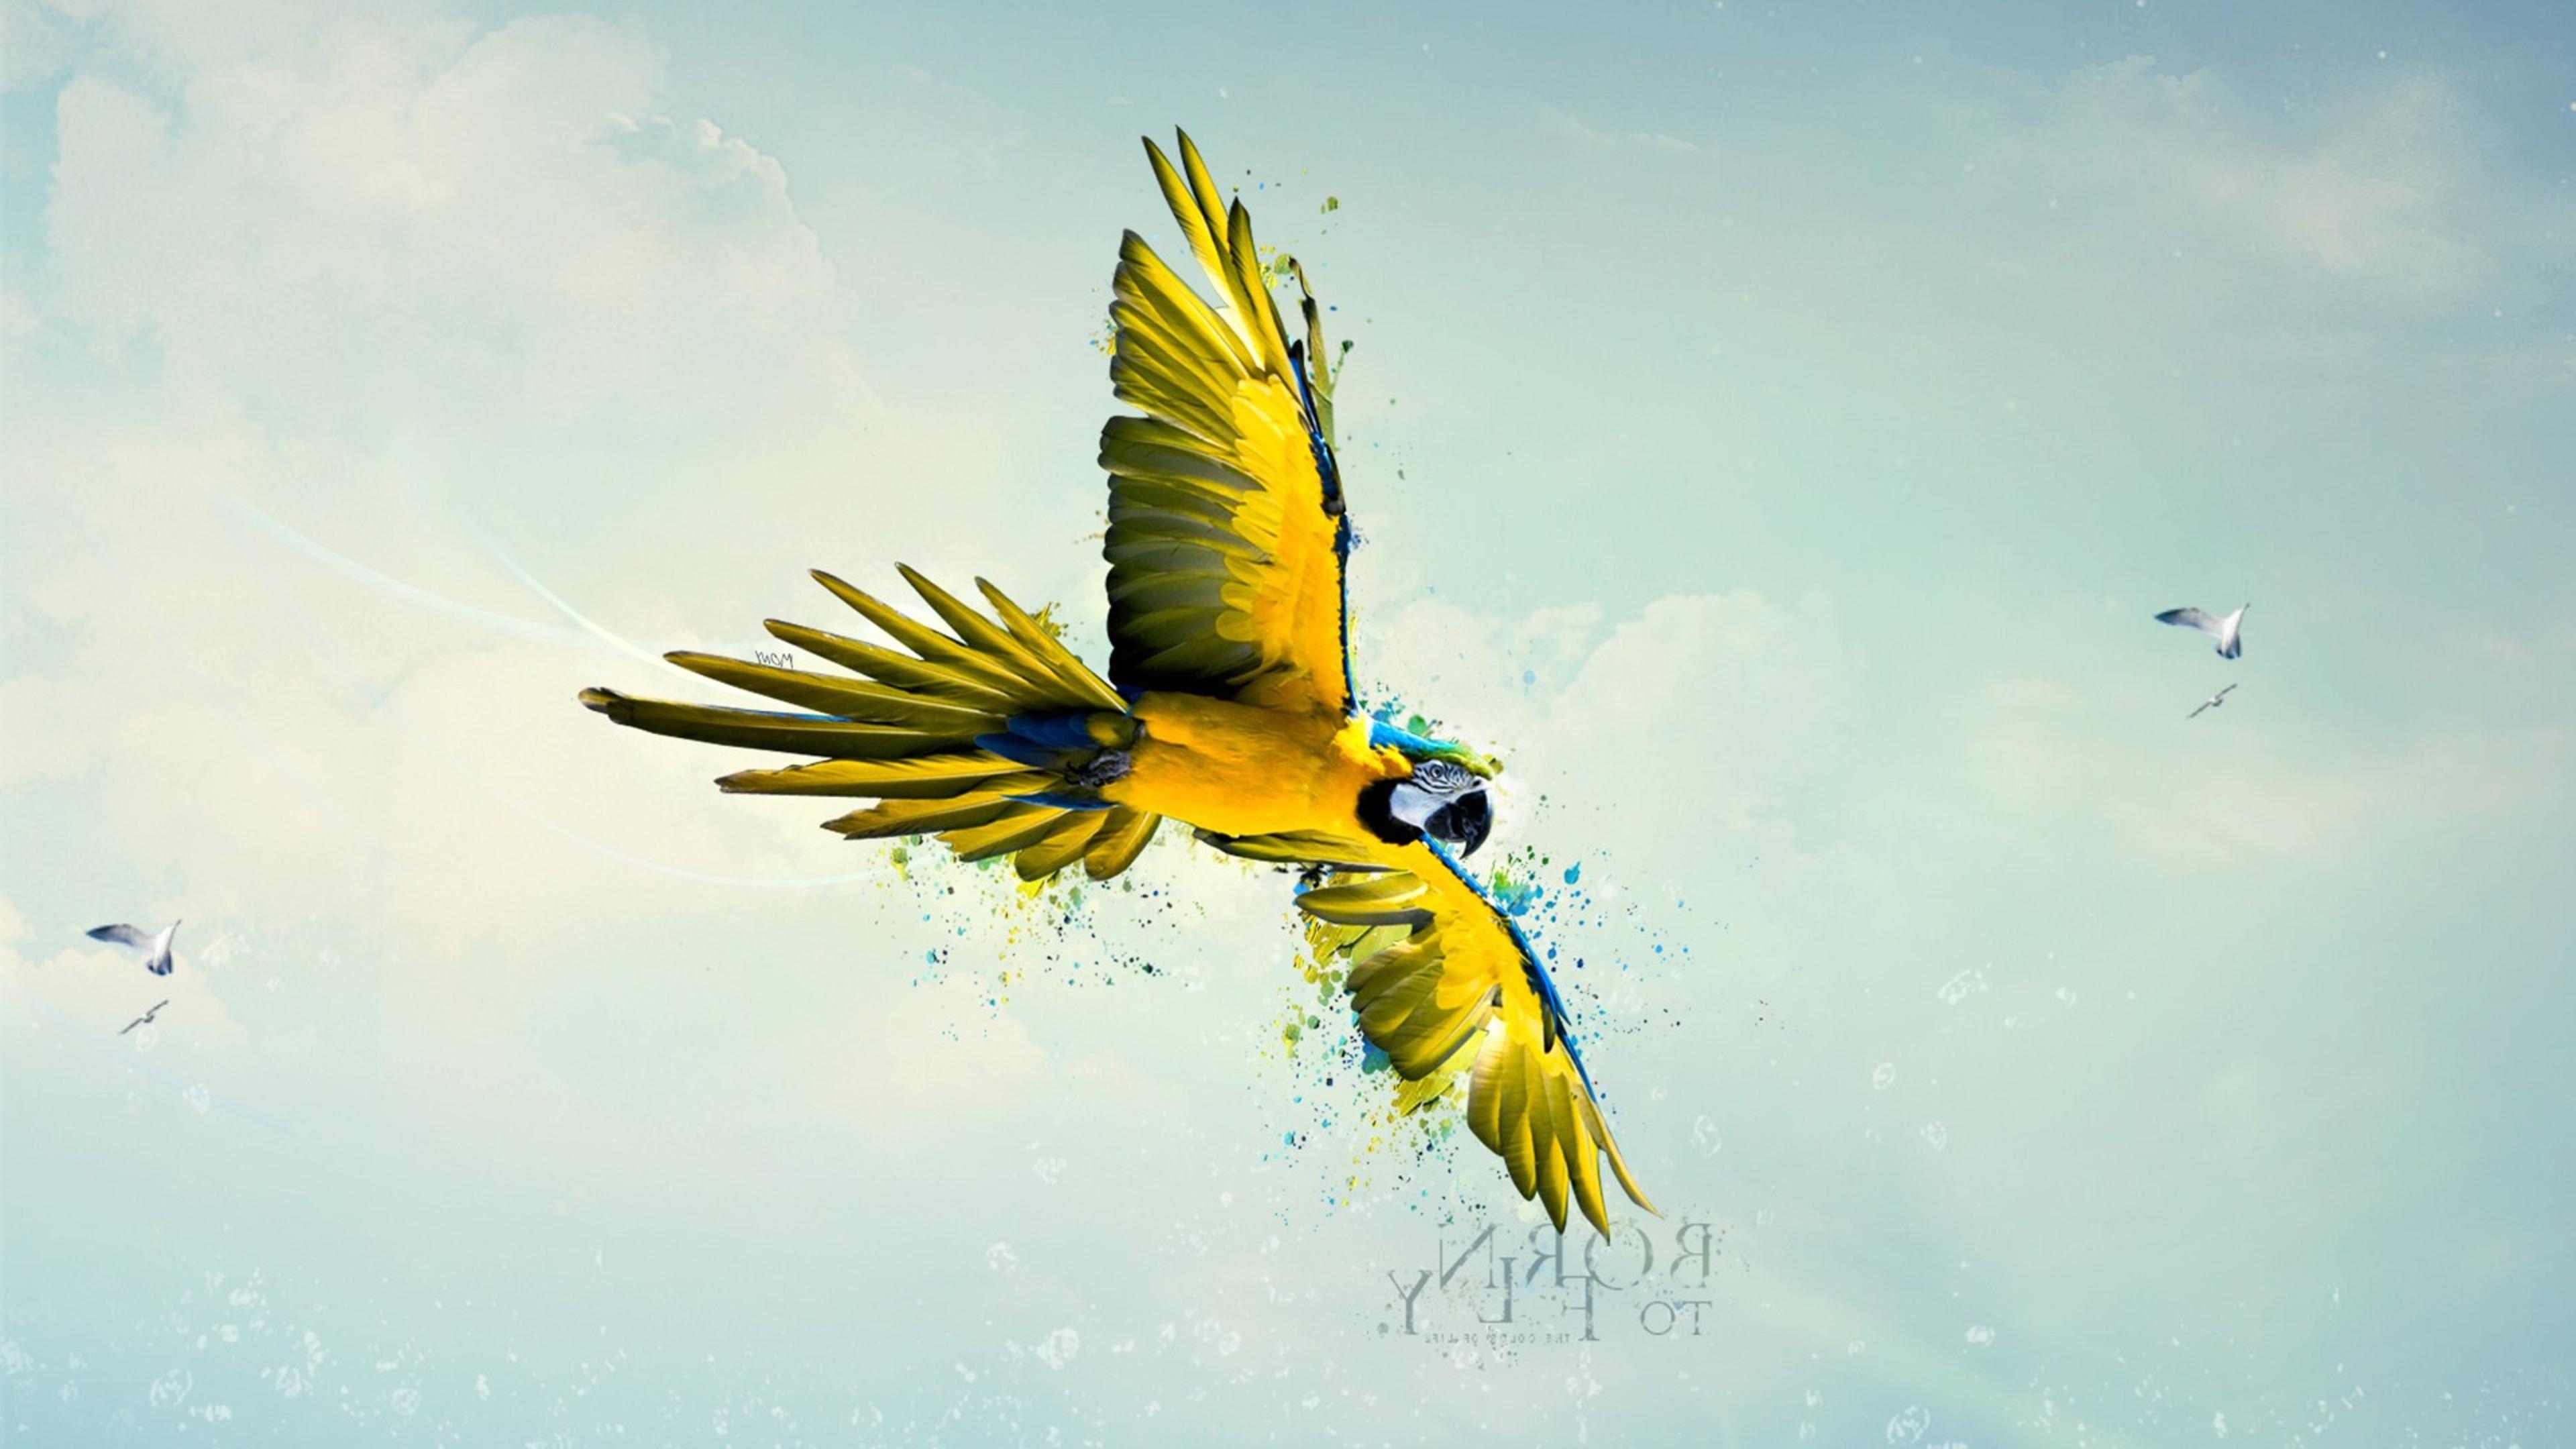 parrot art 4k 1540748503 - Parrot Art 4k - parrot wallpapers, flying wallpapers, digital art wallpapers, artist wallpapers